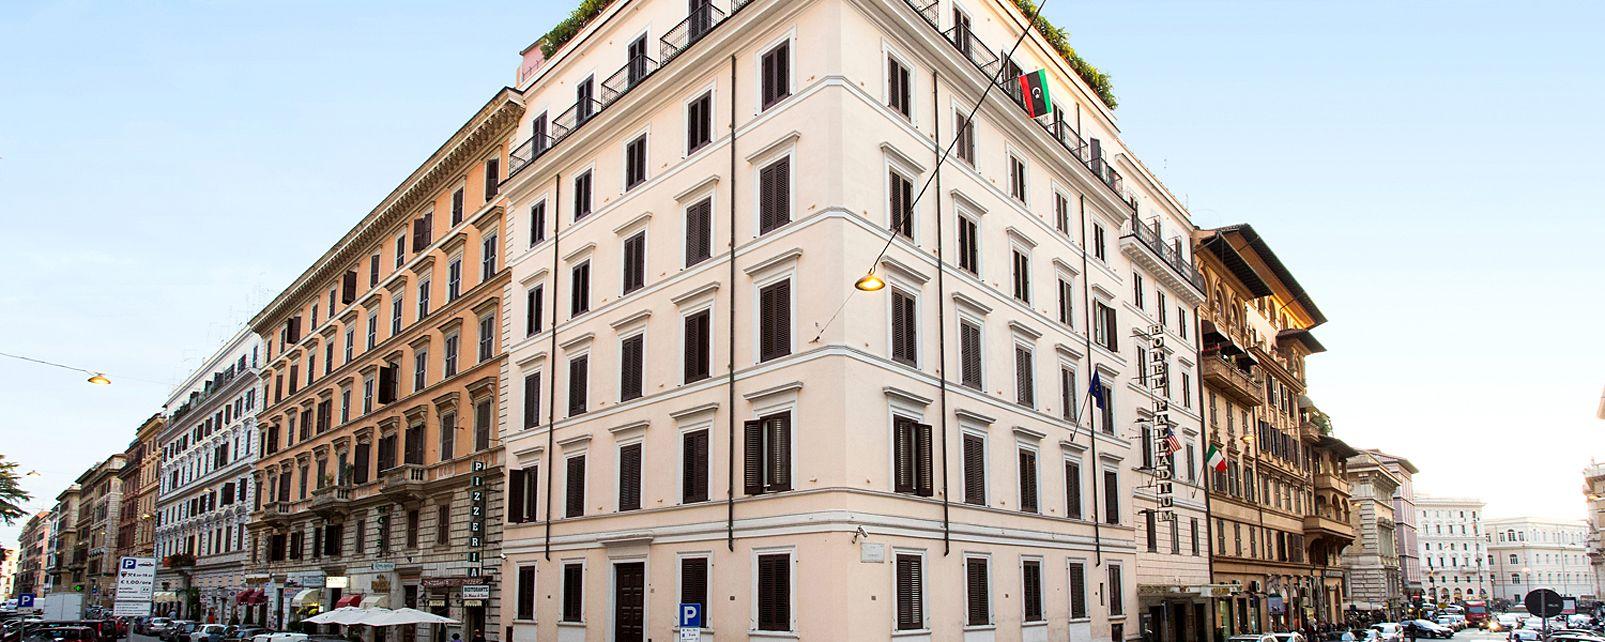 Hotel Palladium Palace Rome